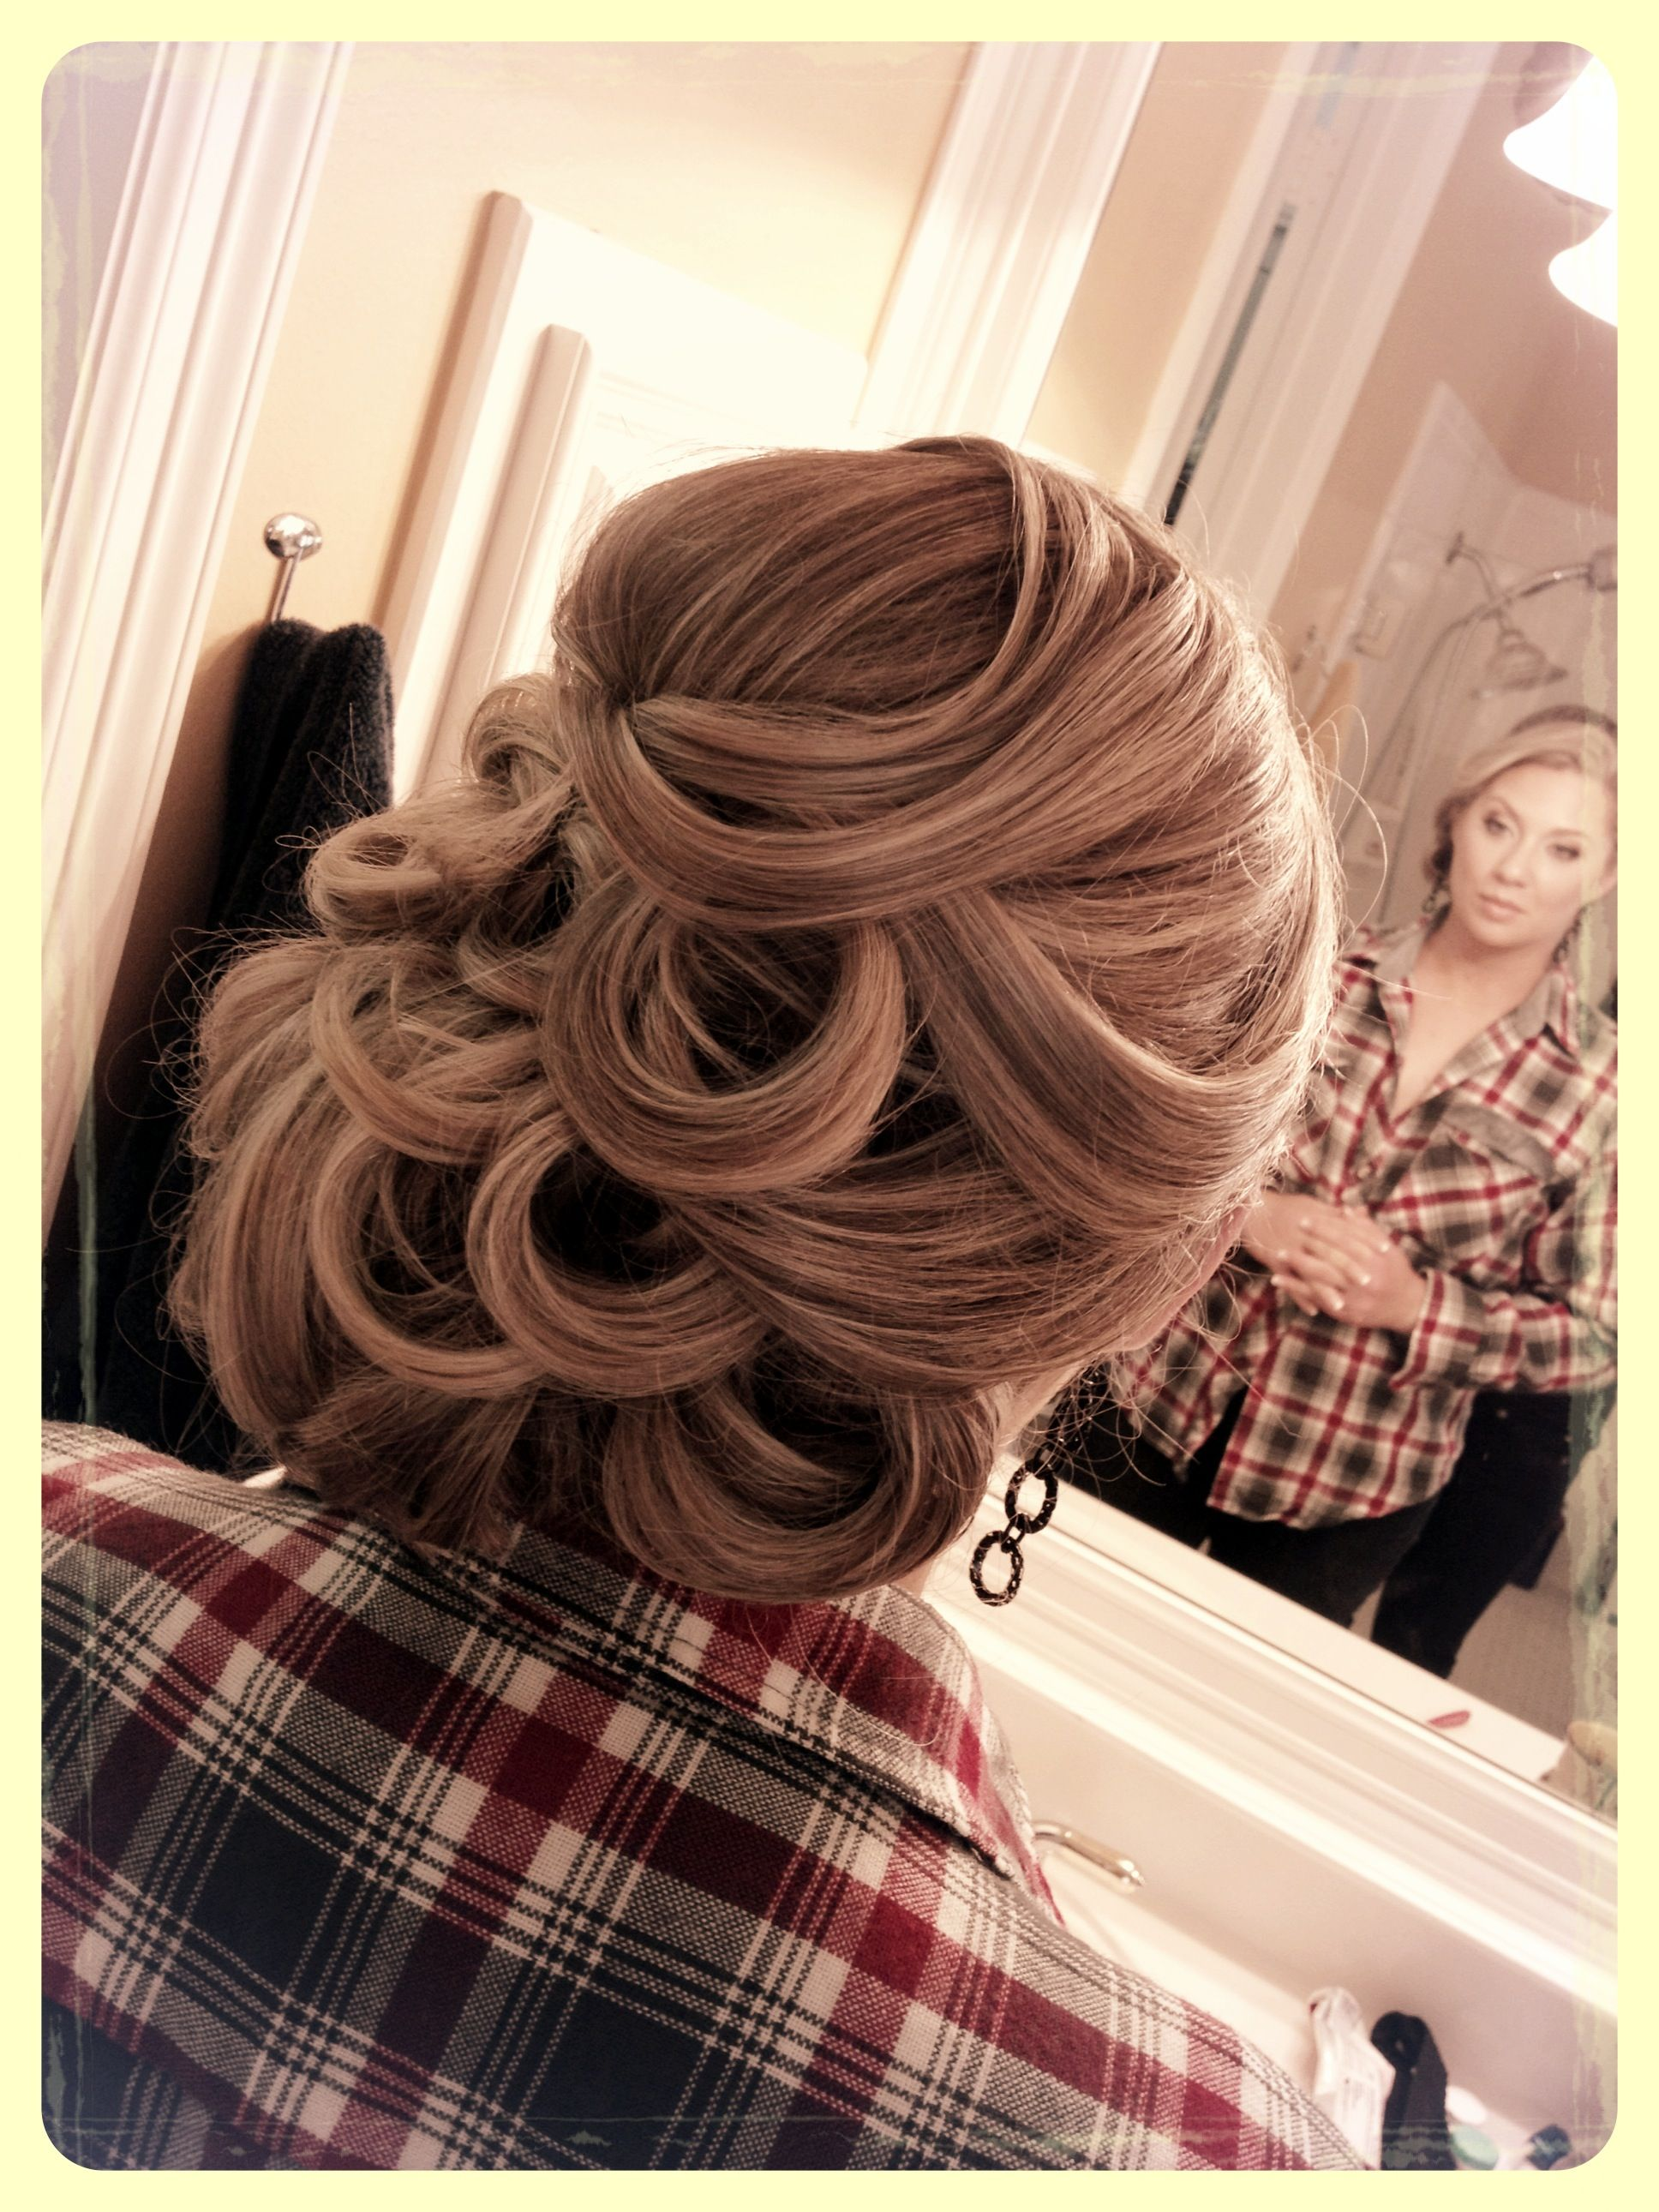 Strange 1000 Images About Wedding Hair On Pinterest Updo Yankee Doodle Short Hairstyles For Black Women Fulllsitofus